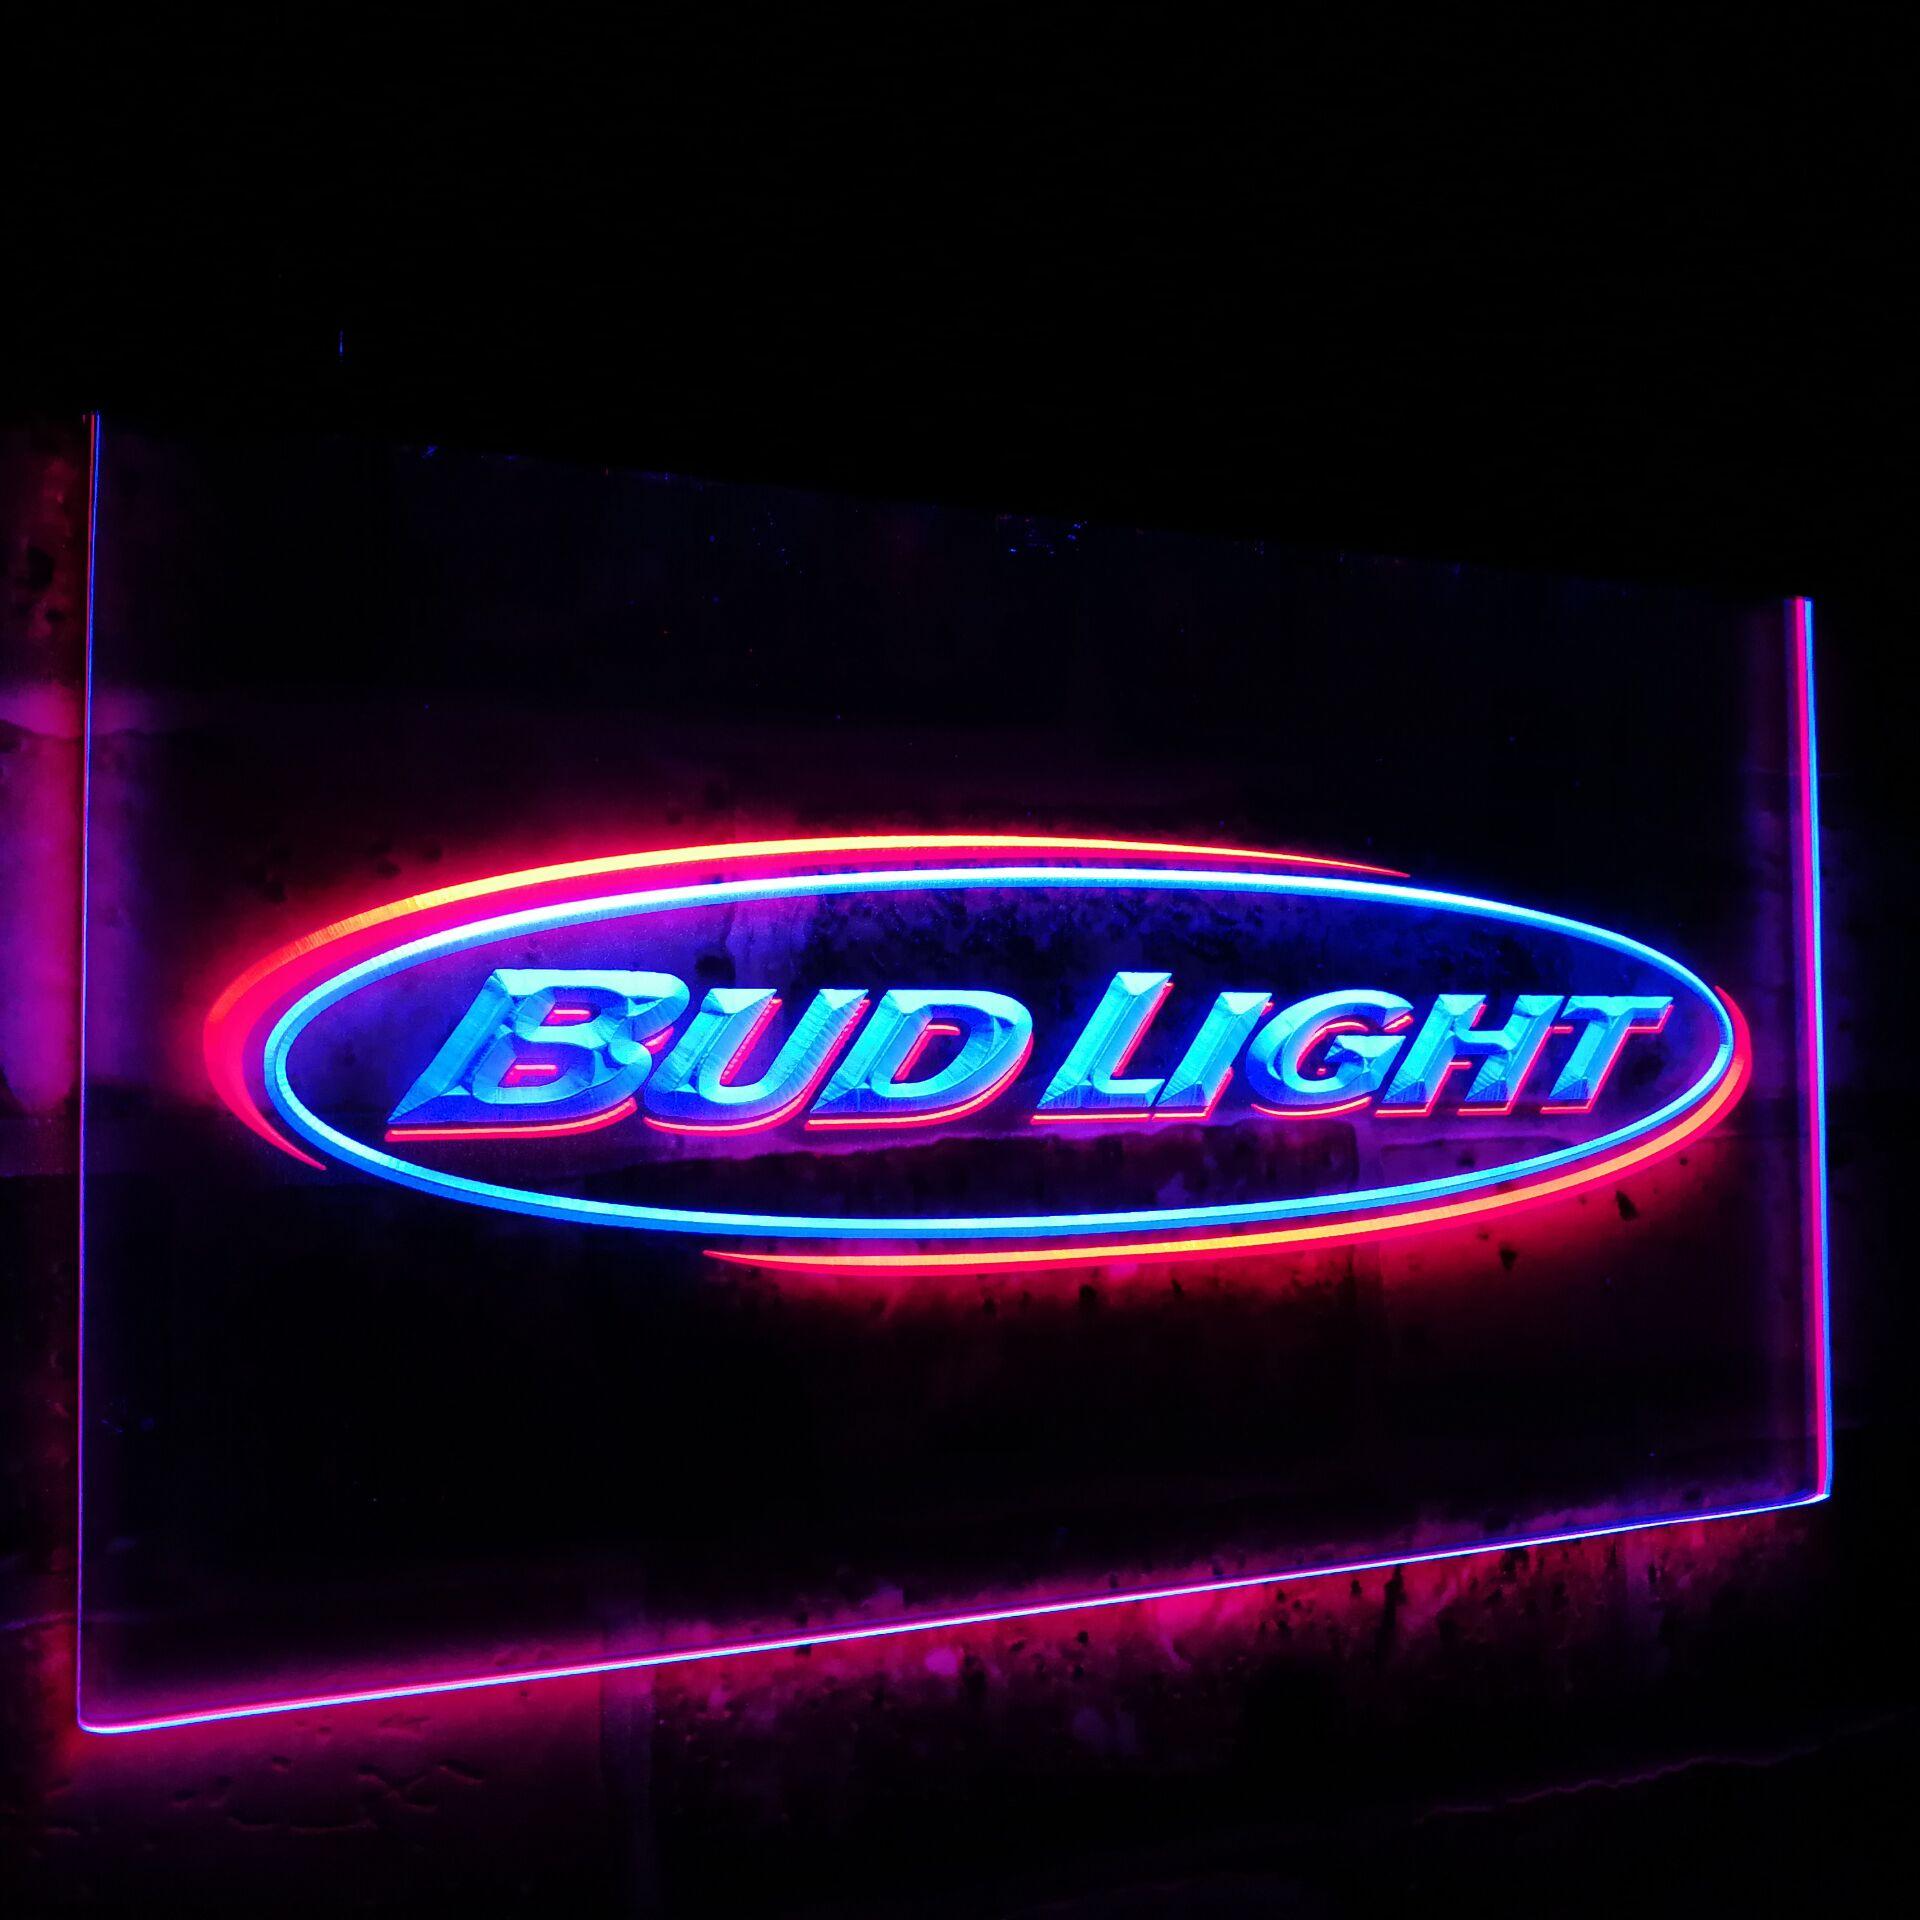 Bud Light Beer Bar Decoration Gift Dual Color Led Neon Light Signs st6 0001